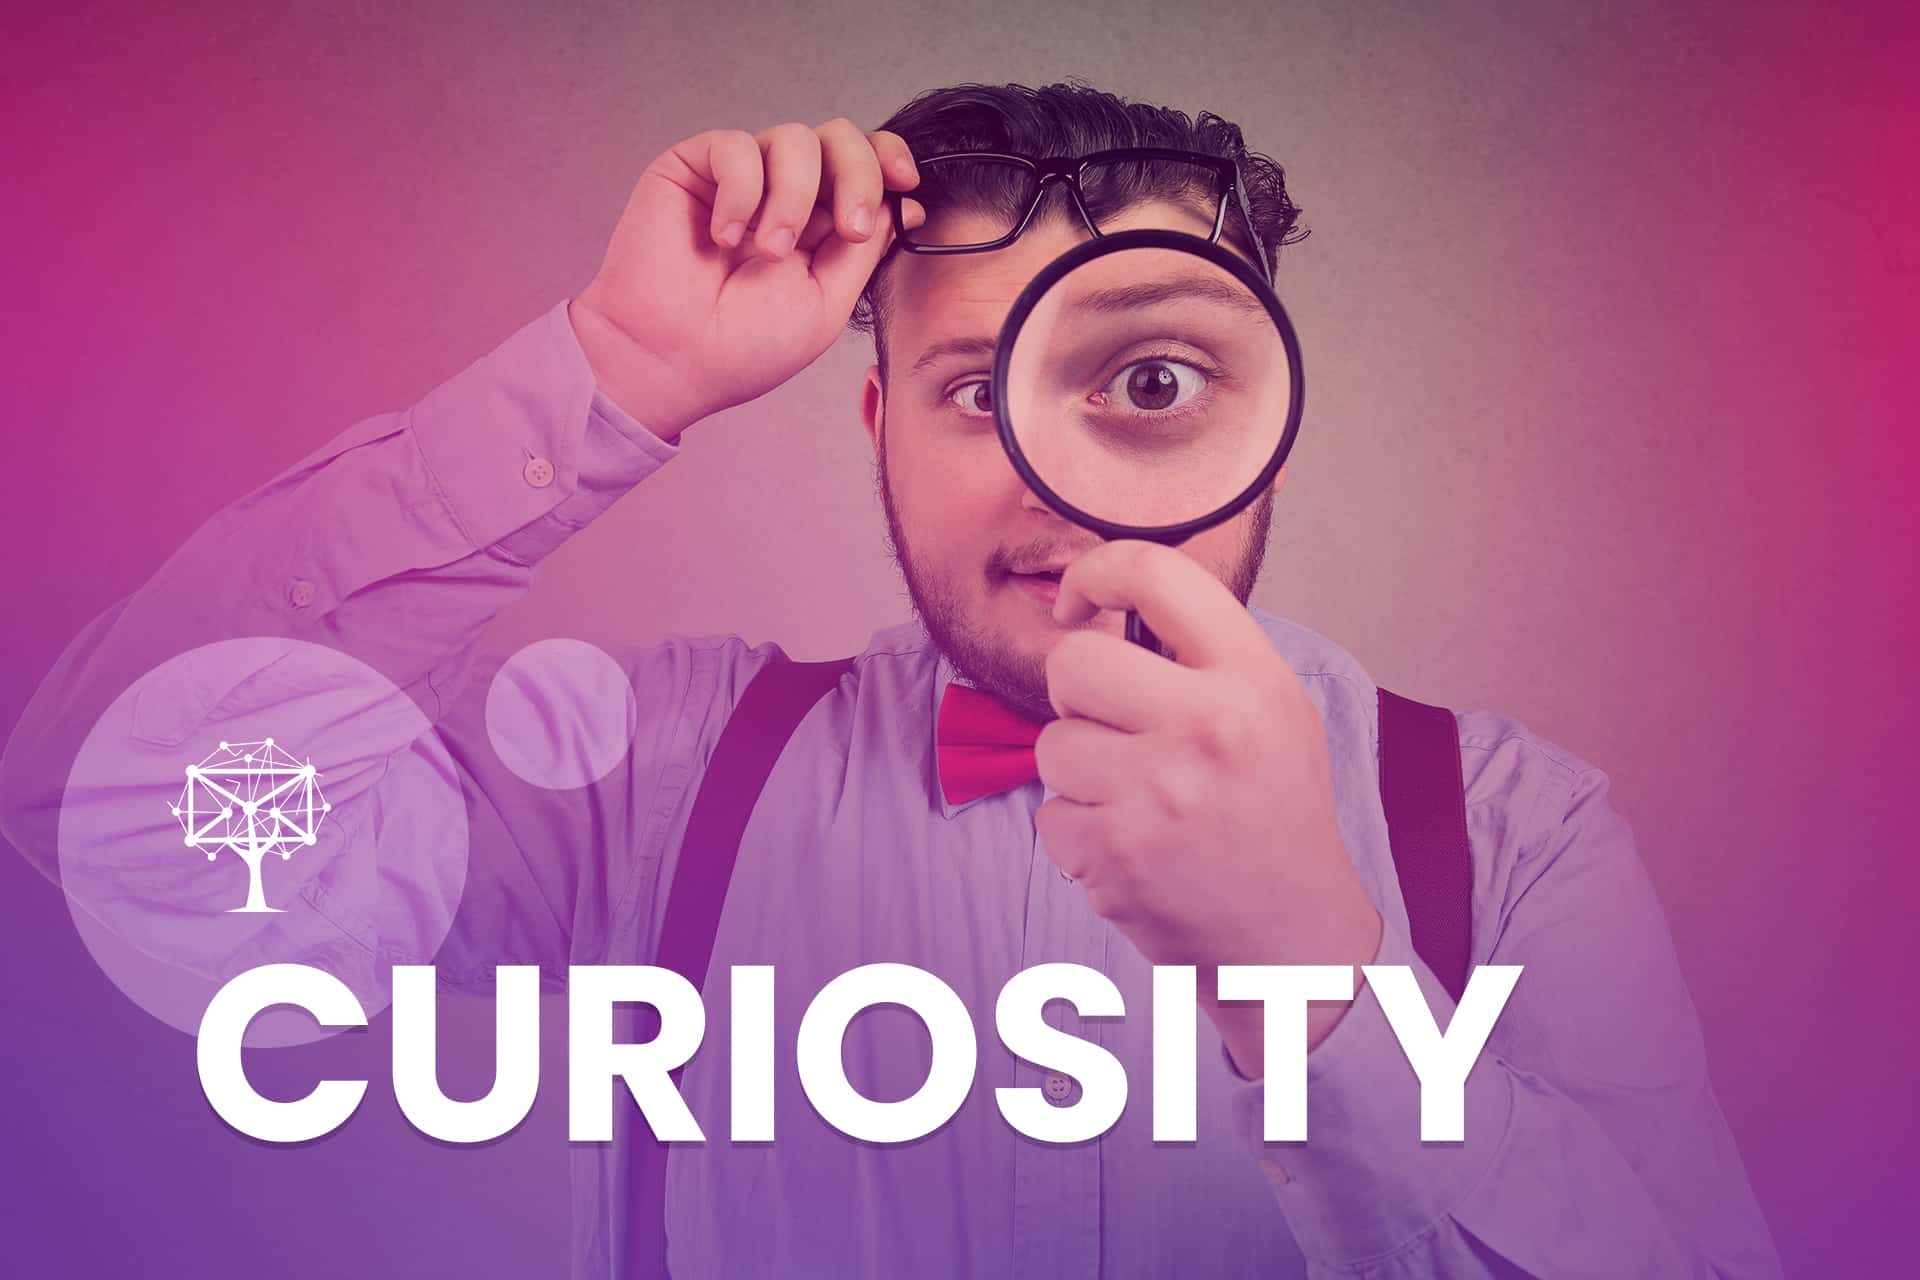 Curiosity is a key customer service skill